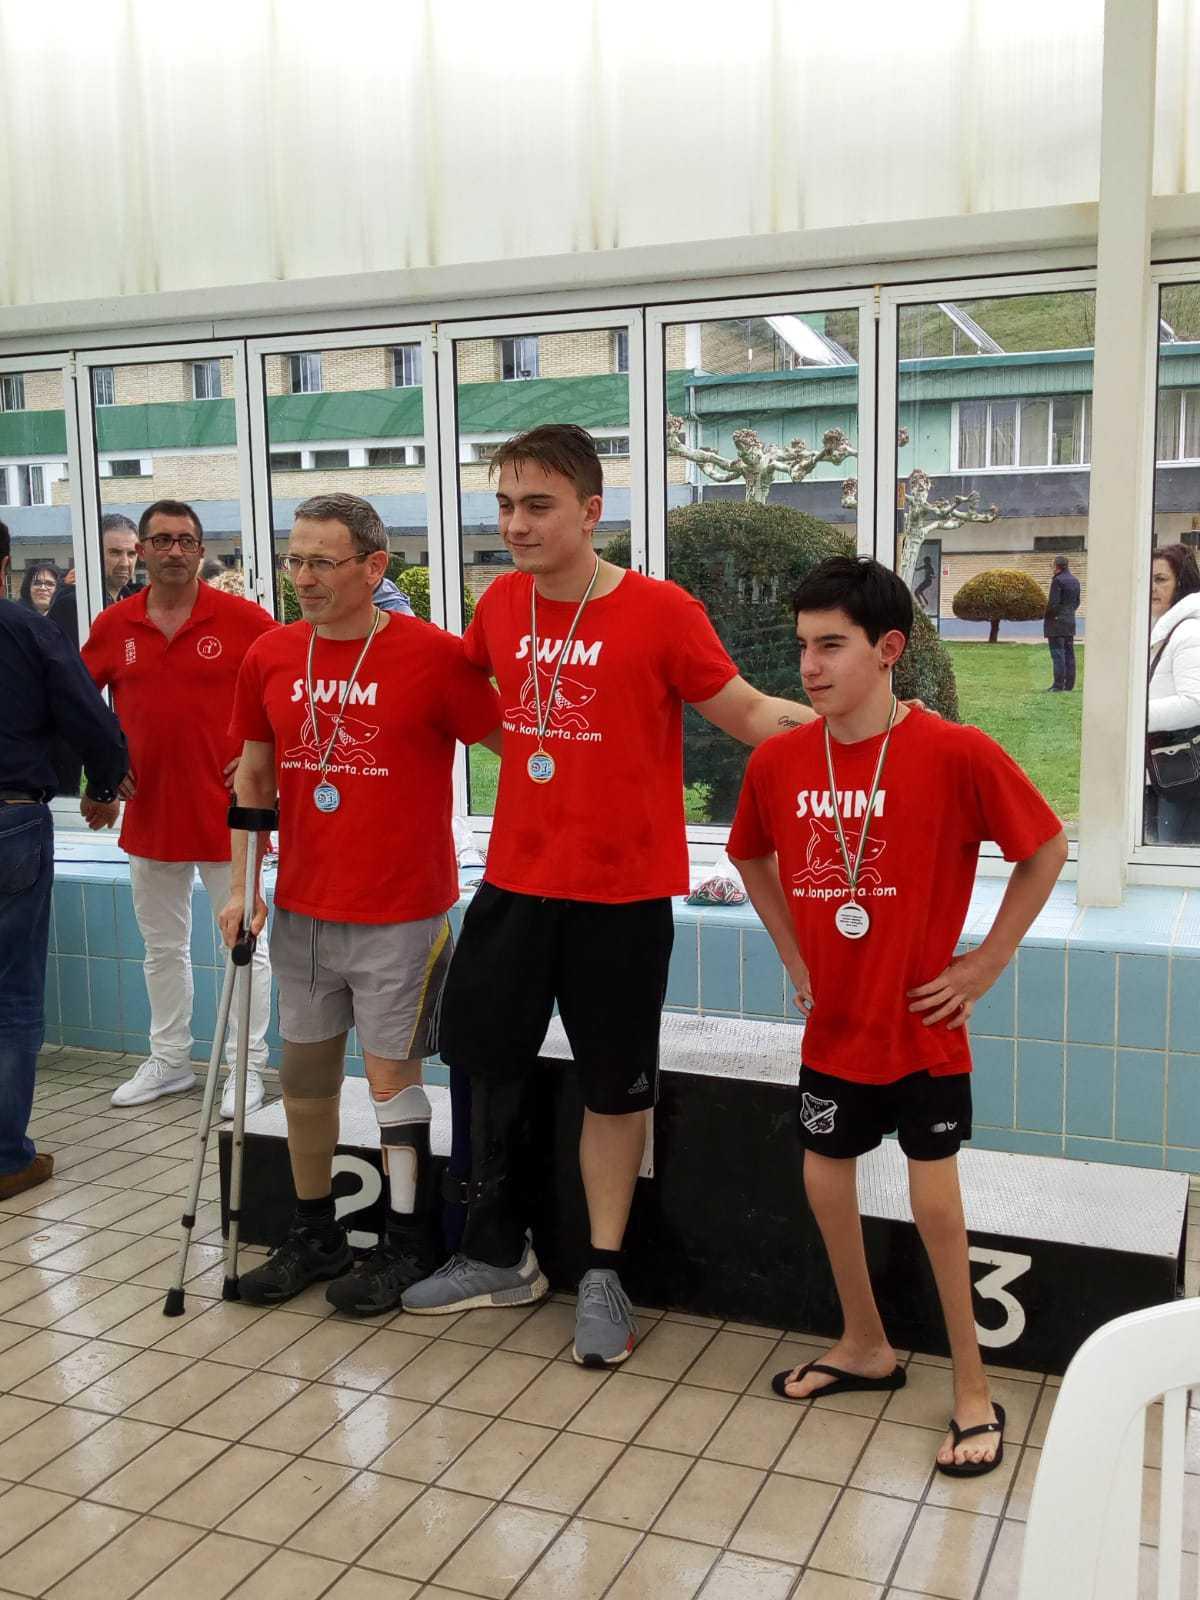 Konporta K.E. Participa en el Campeonato de EH en Pamplona. - Konporta